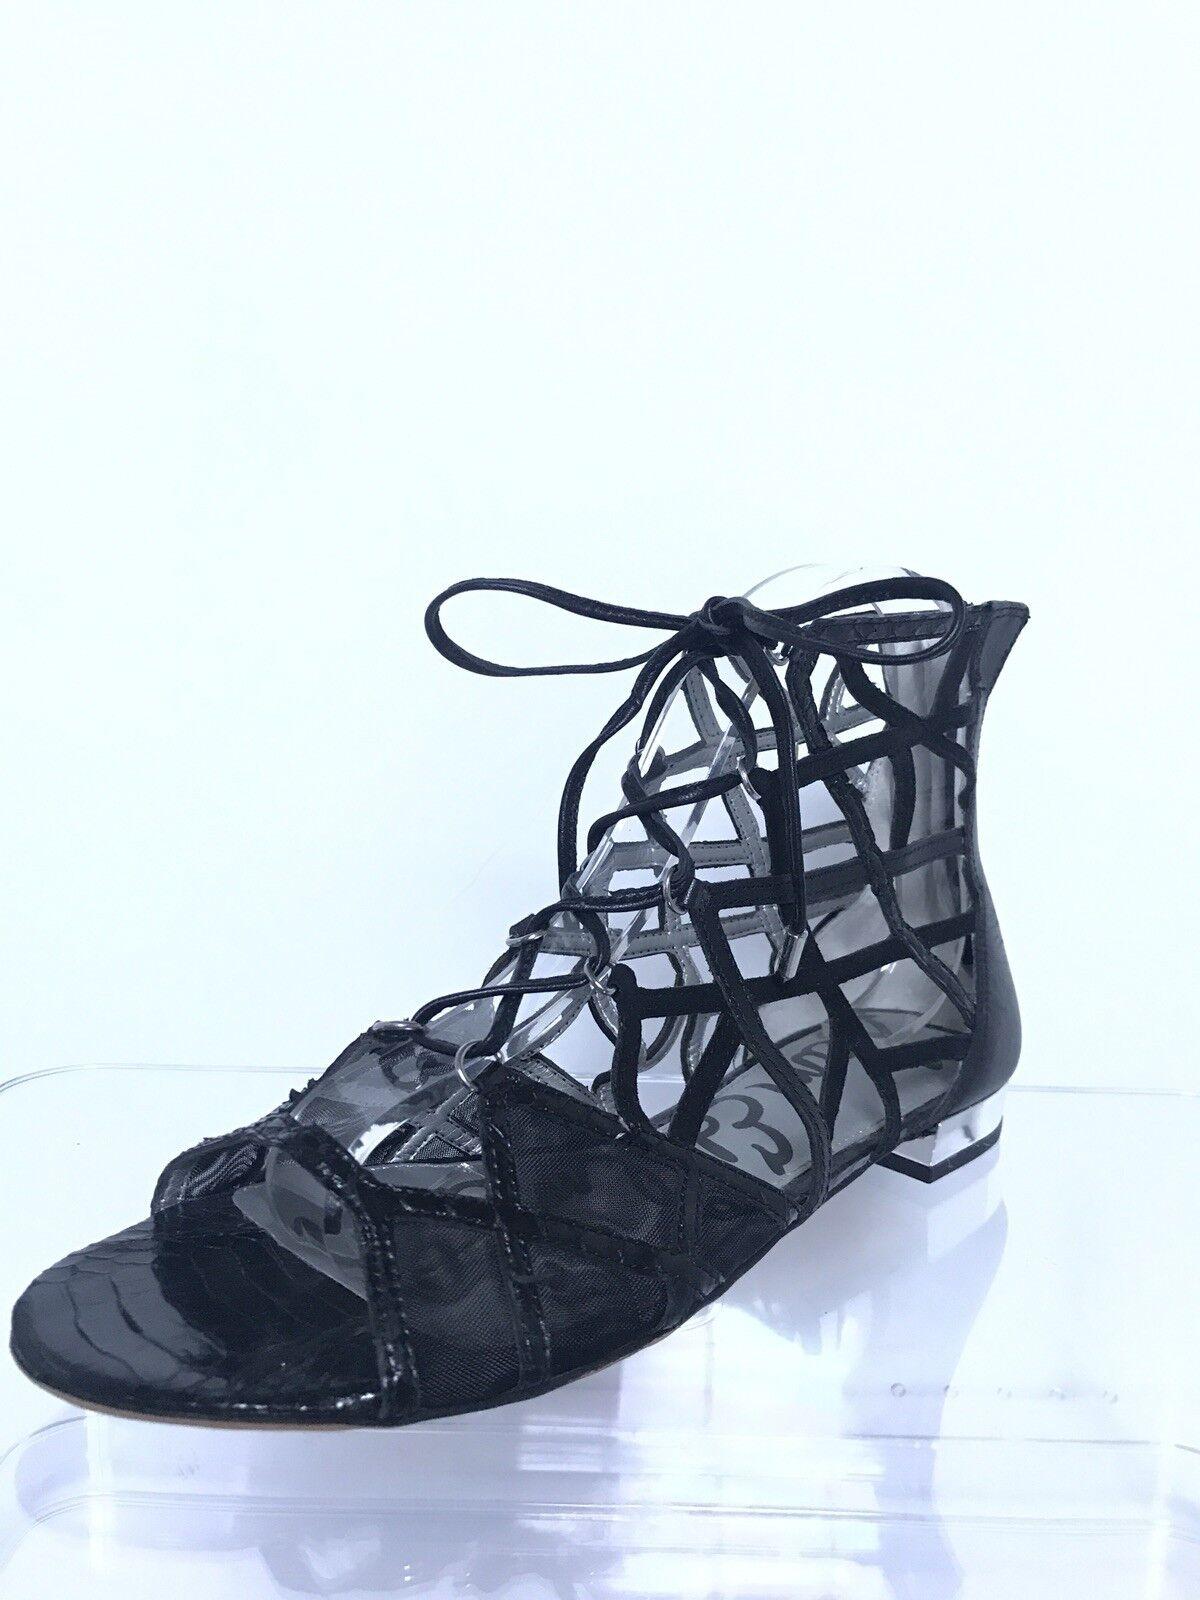 Sam Edelman Gladiator Black Strappy Leather Sandals back zipper womens 8